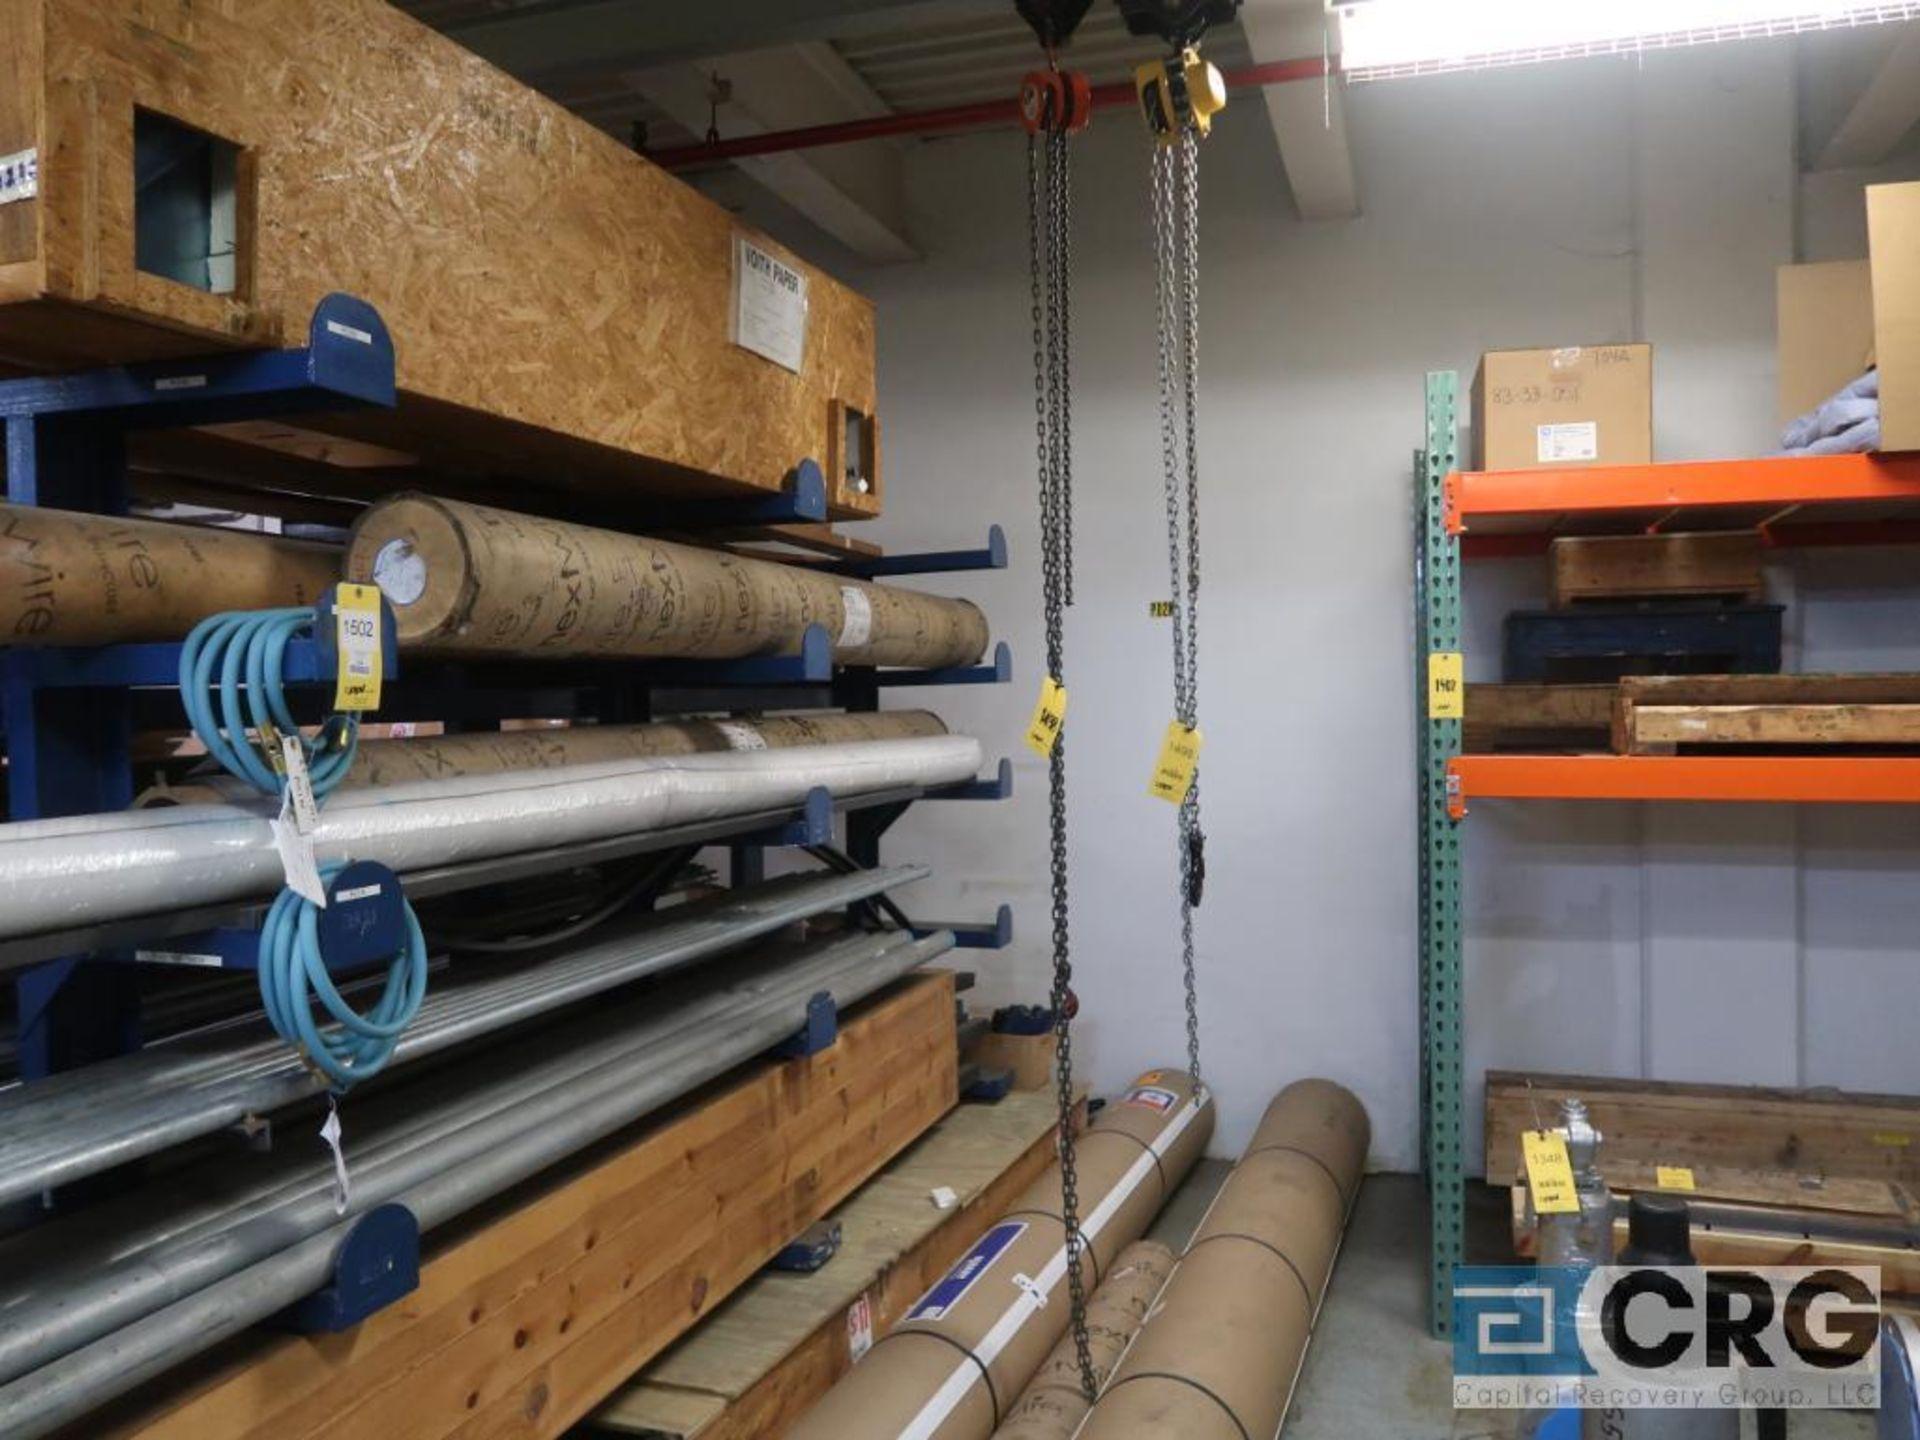 Lot of (3) chain hoists, 1/2 ton cap.-no rail (Stores Area) - Image 2 of 3